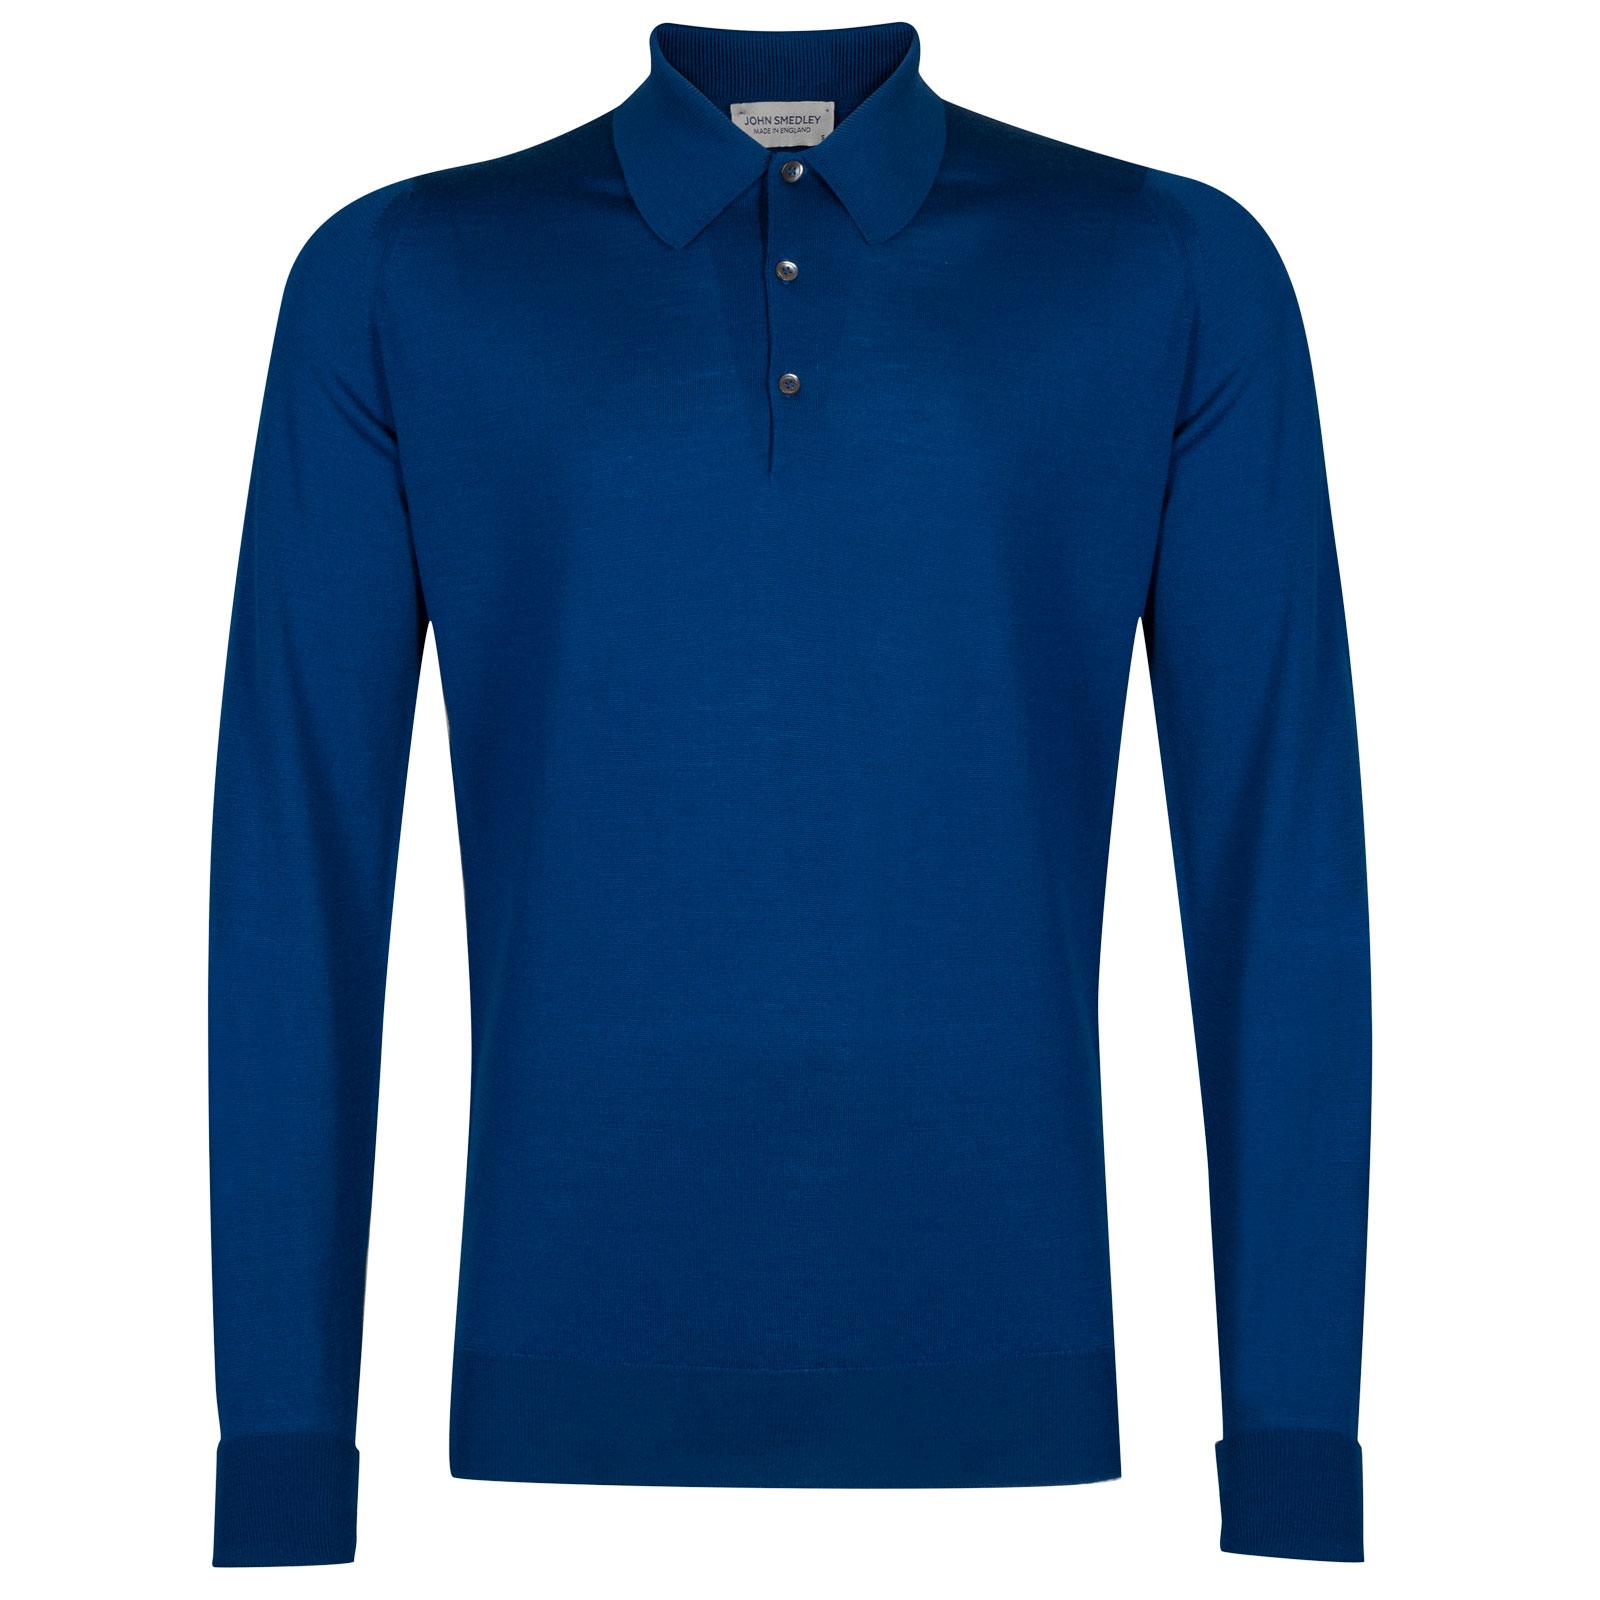 dorset-breton-blue-Xl